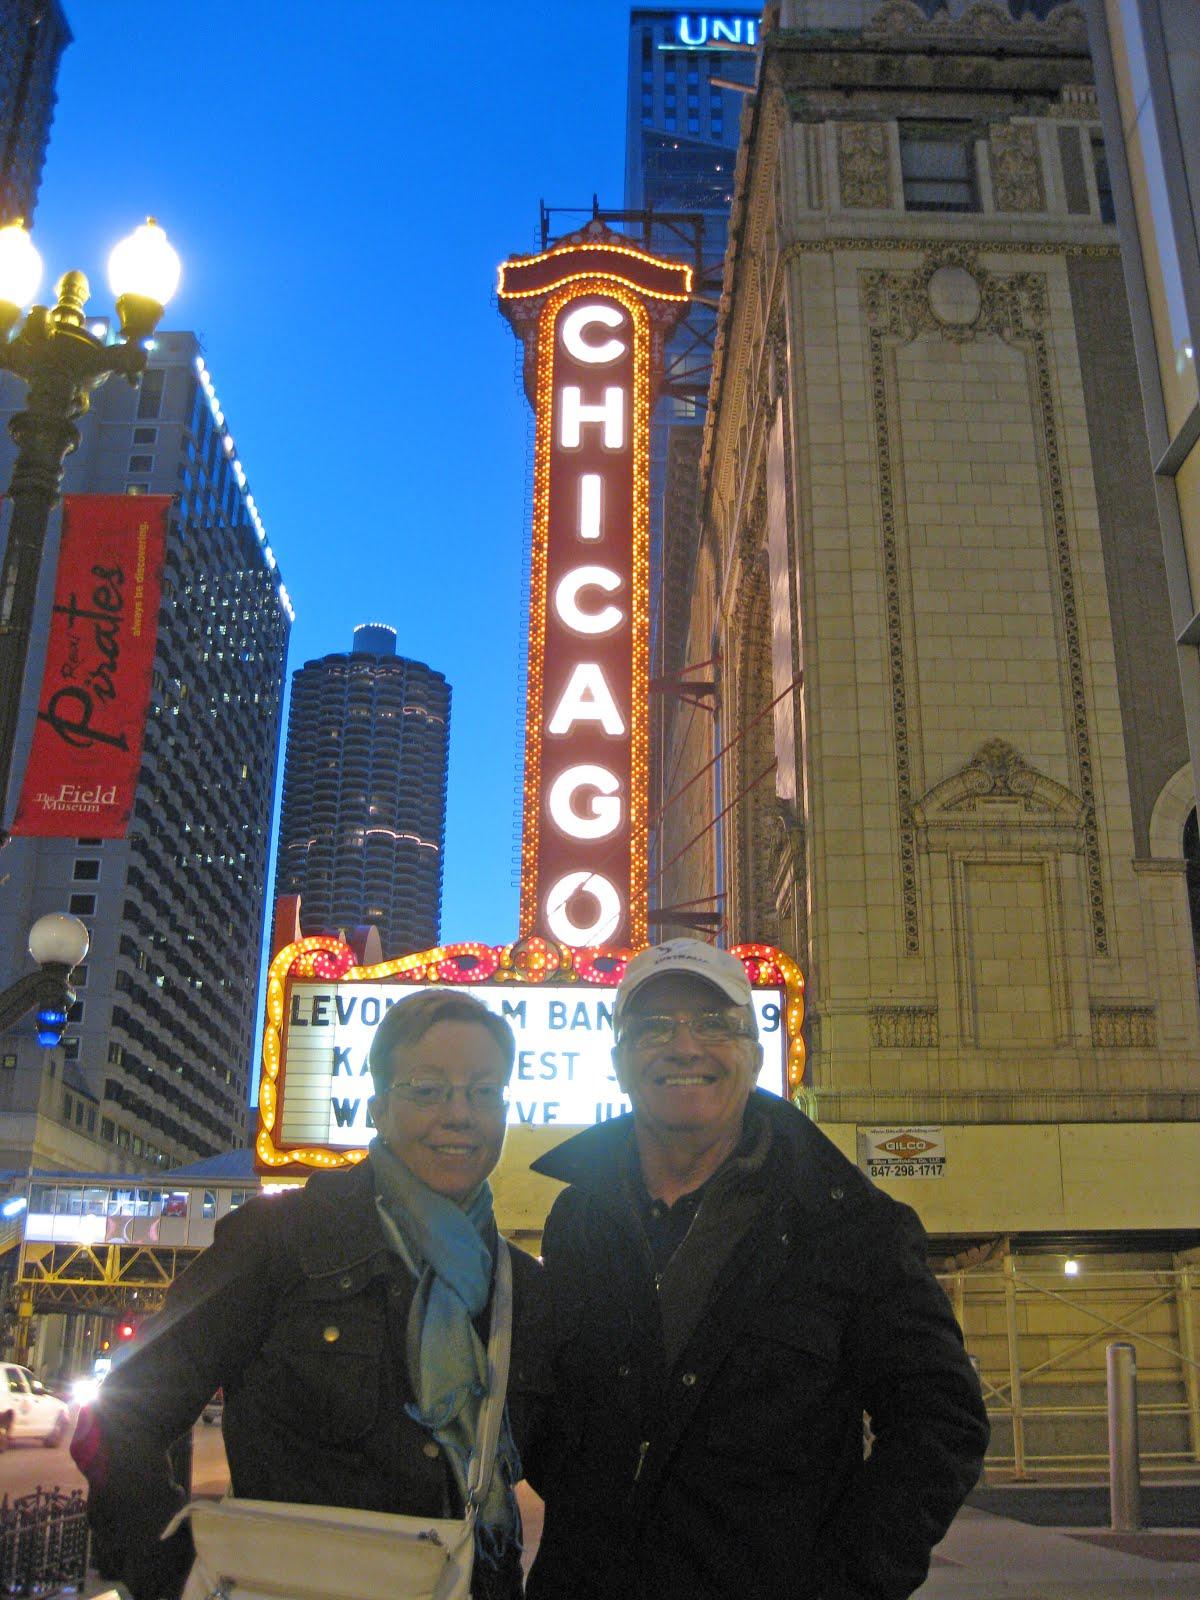 Chicago de noche.